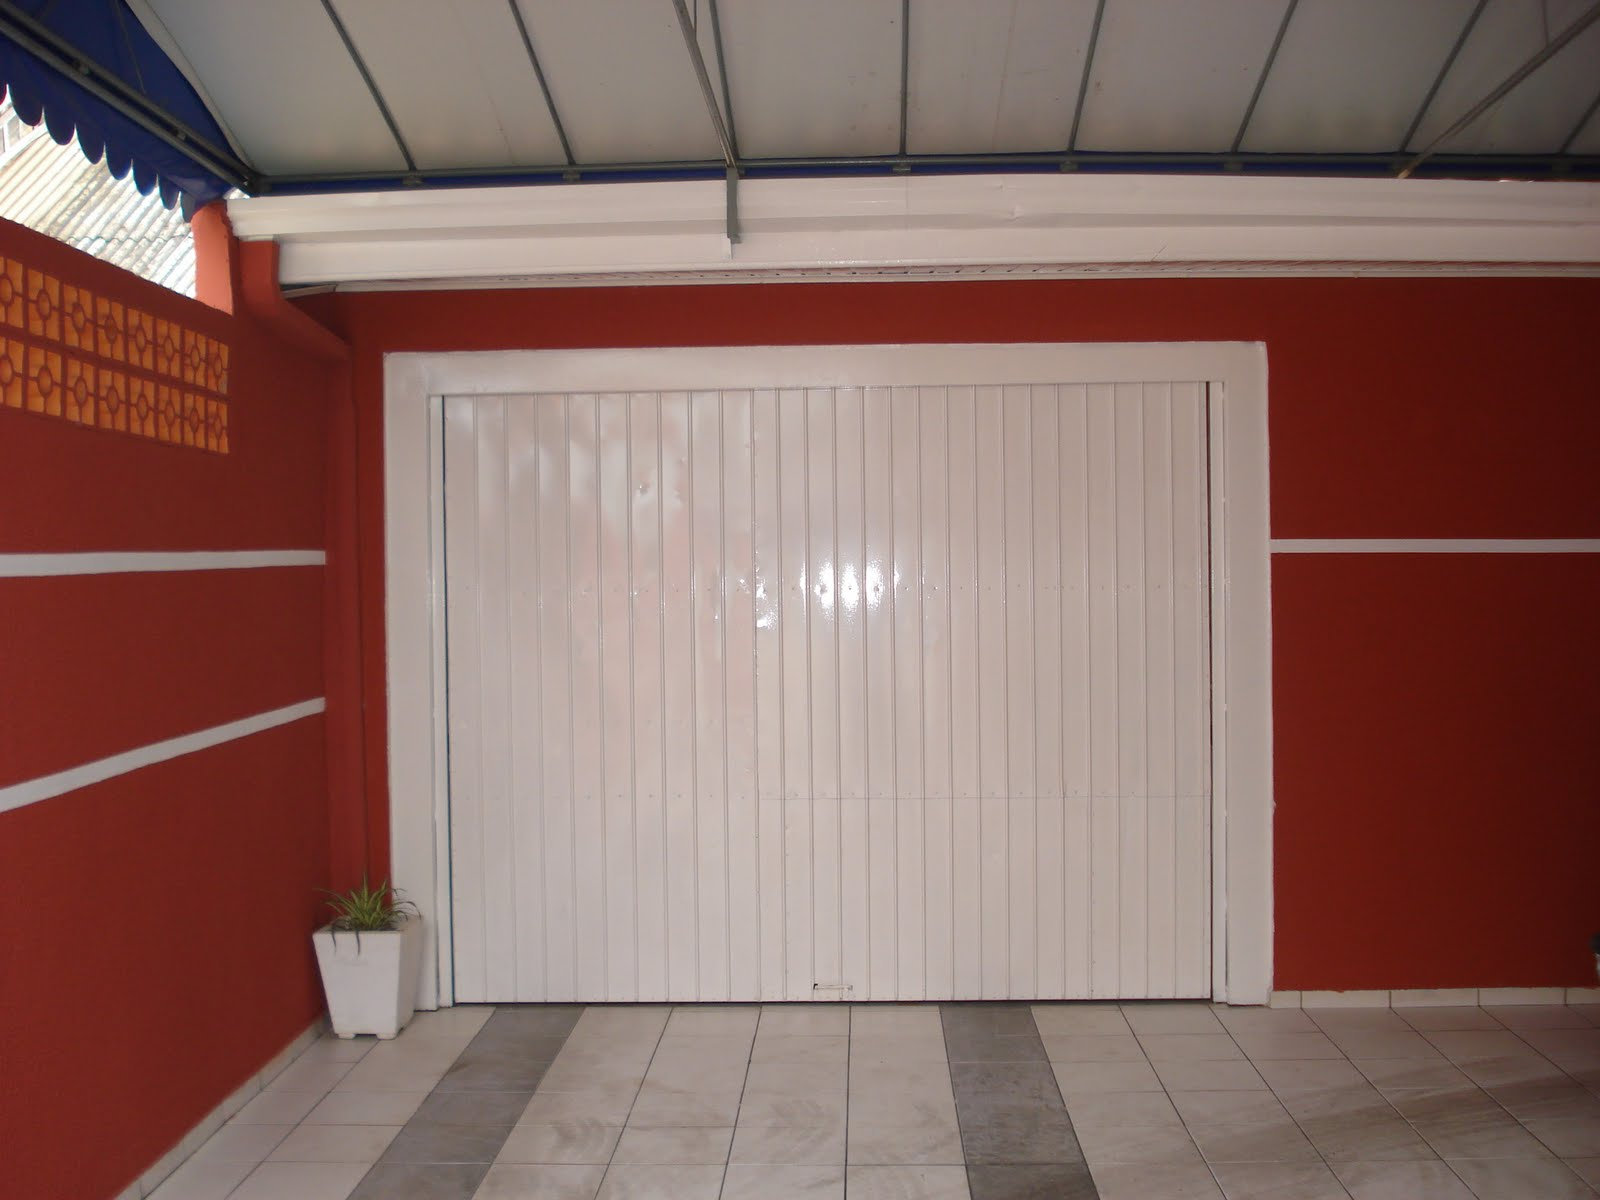 PORTAL PINTURA E ARTE SILVA Muros beirais e detalhes na casa em texturas corpo da casa